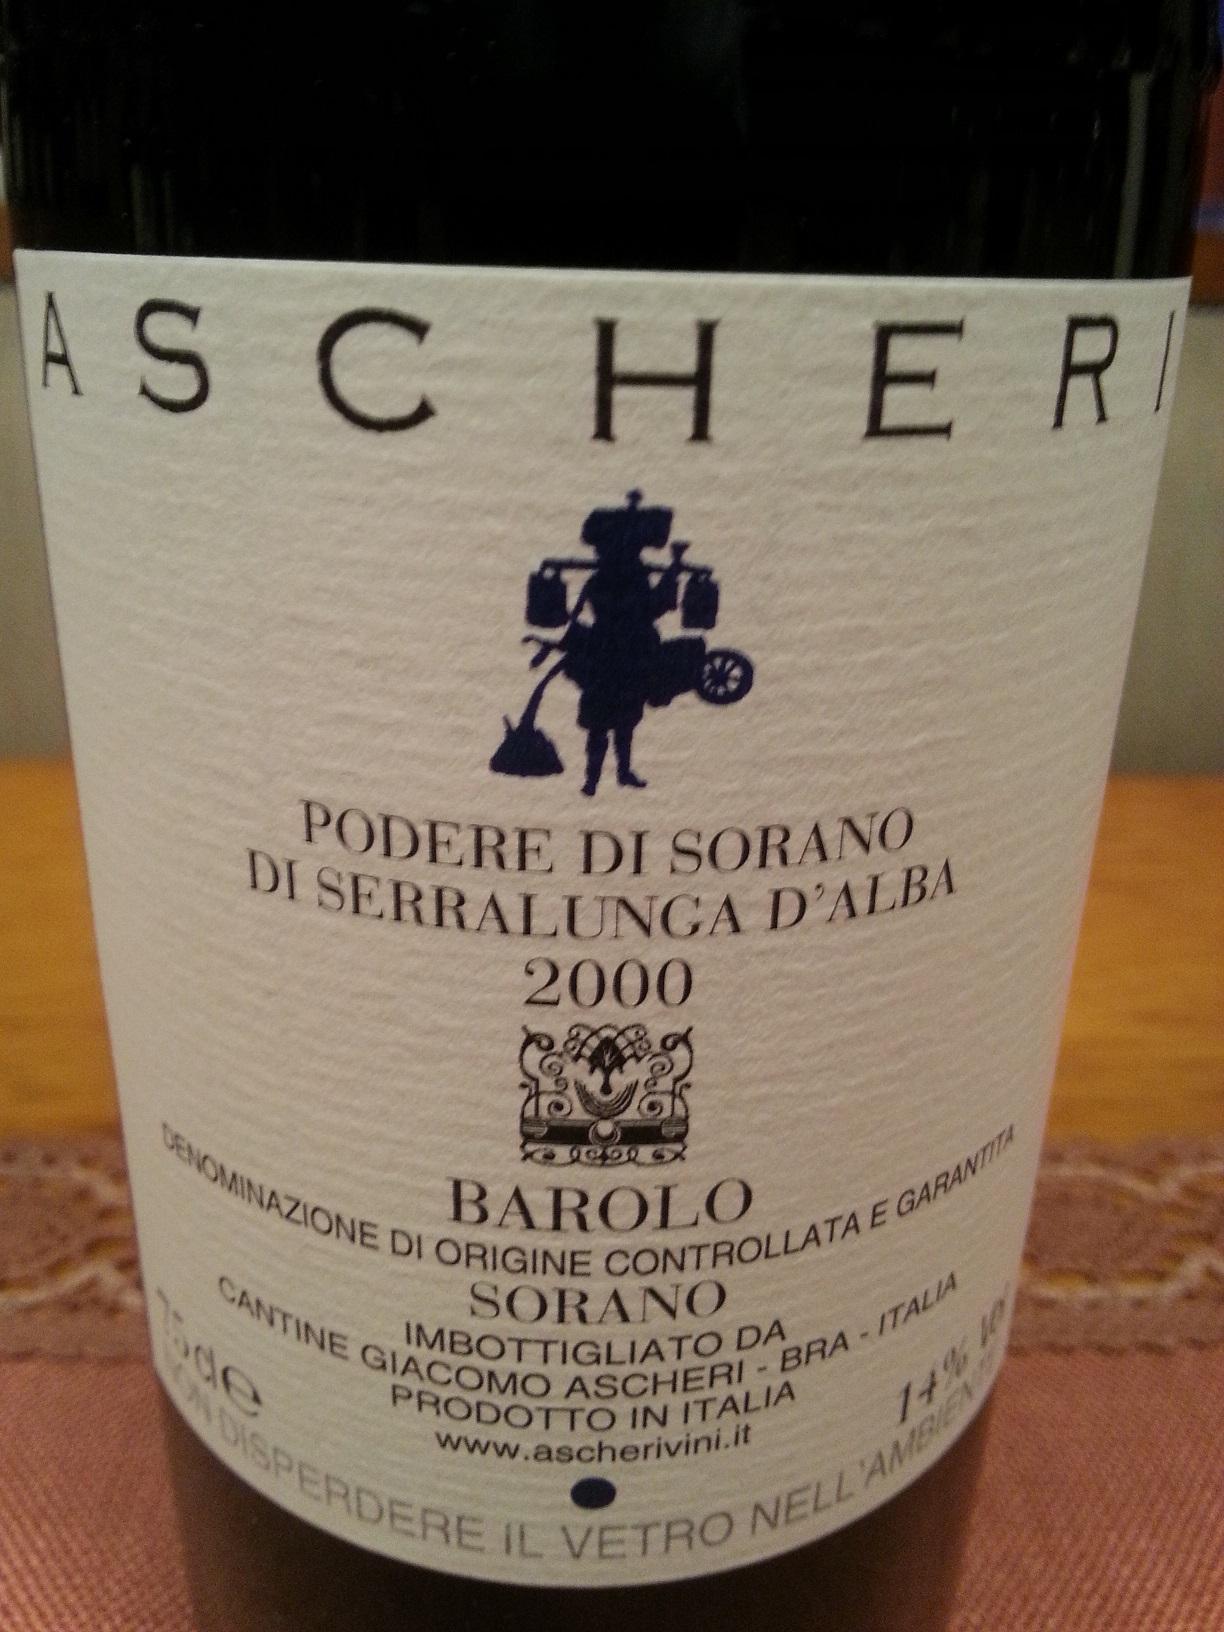 2000 Barolo Sorano | Ascheri